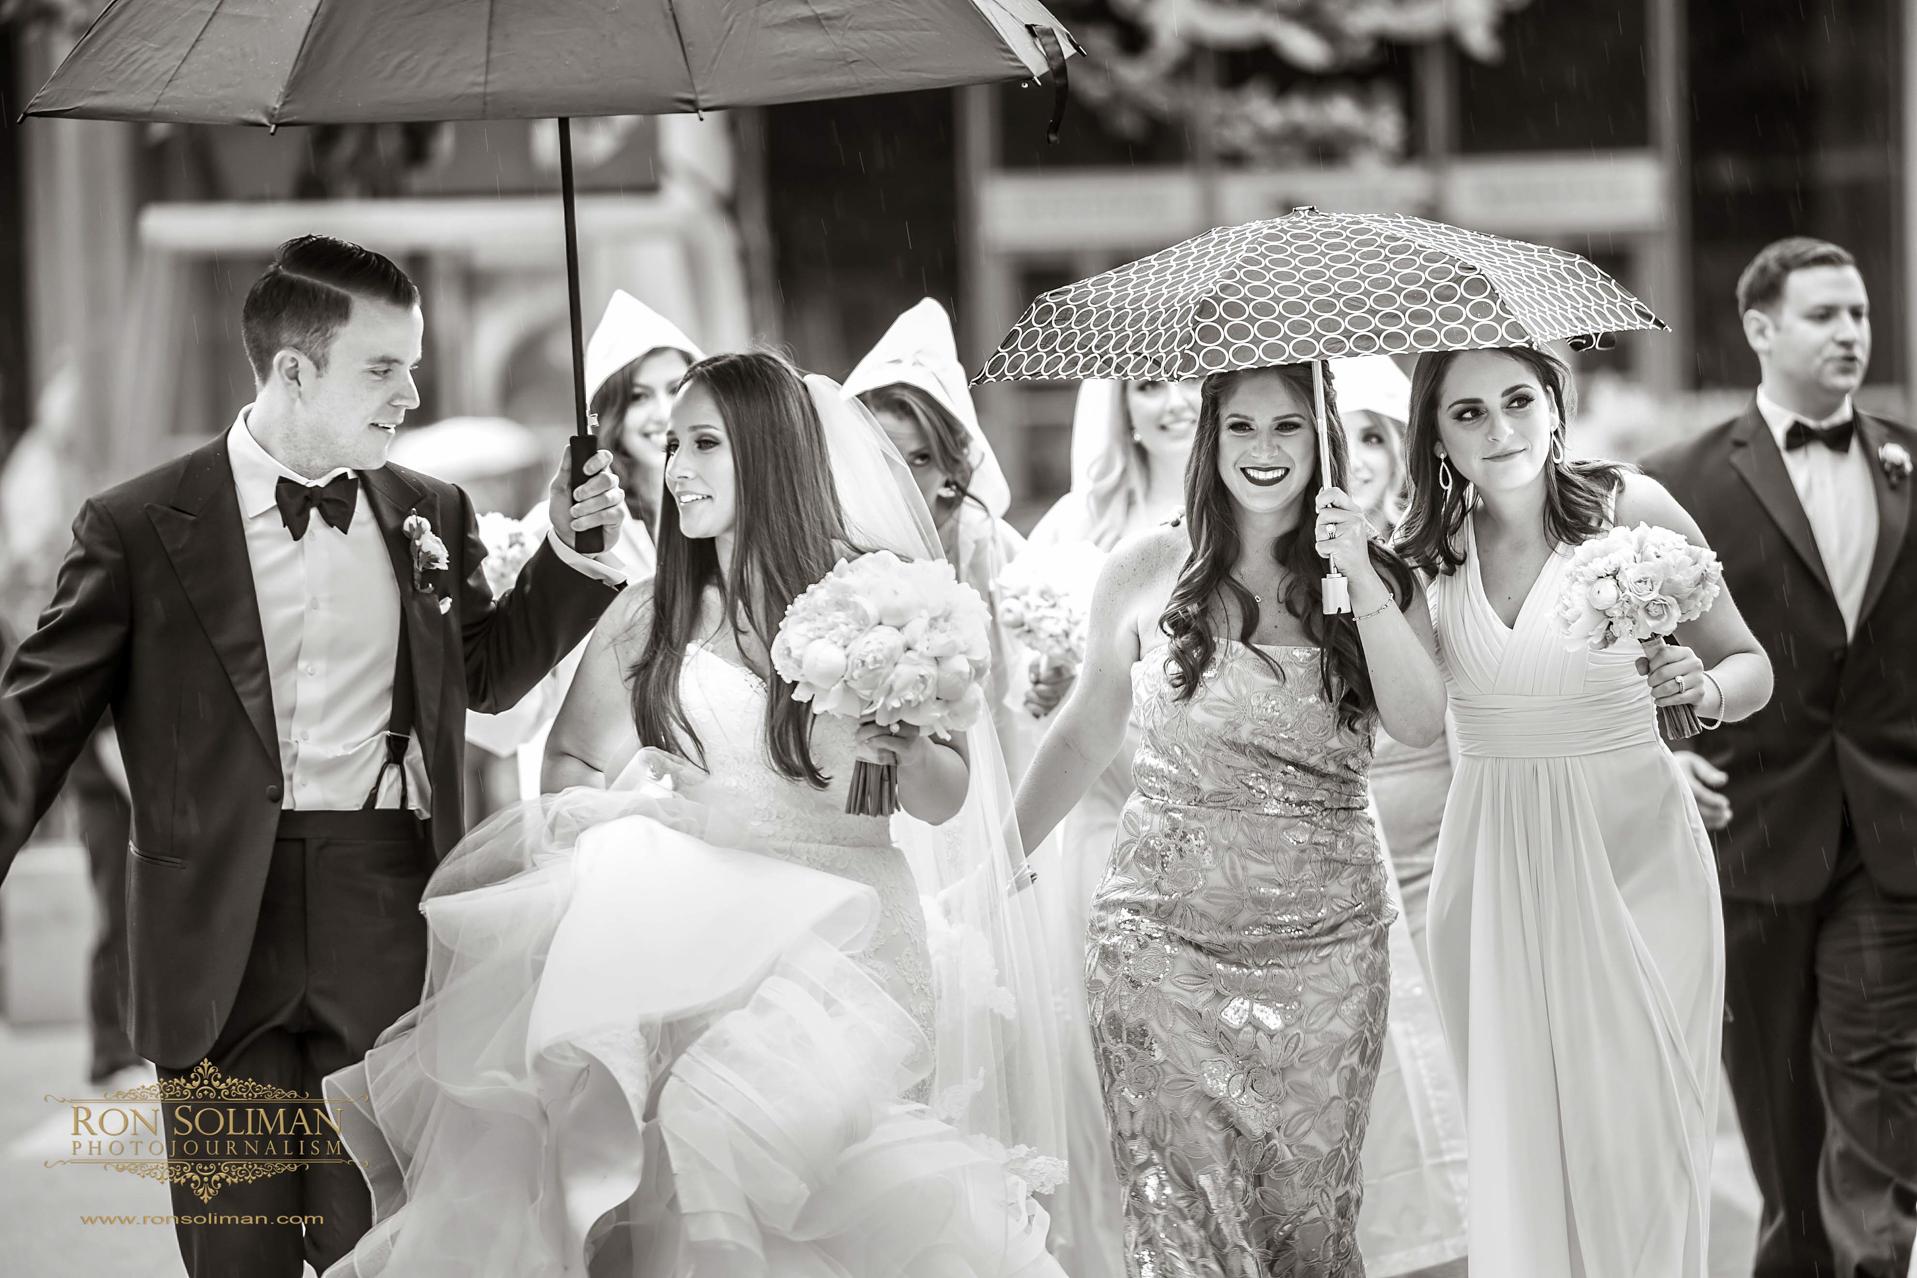 UNION TRUST WEDDING 026